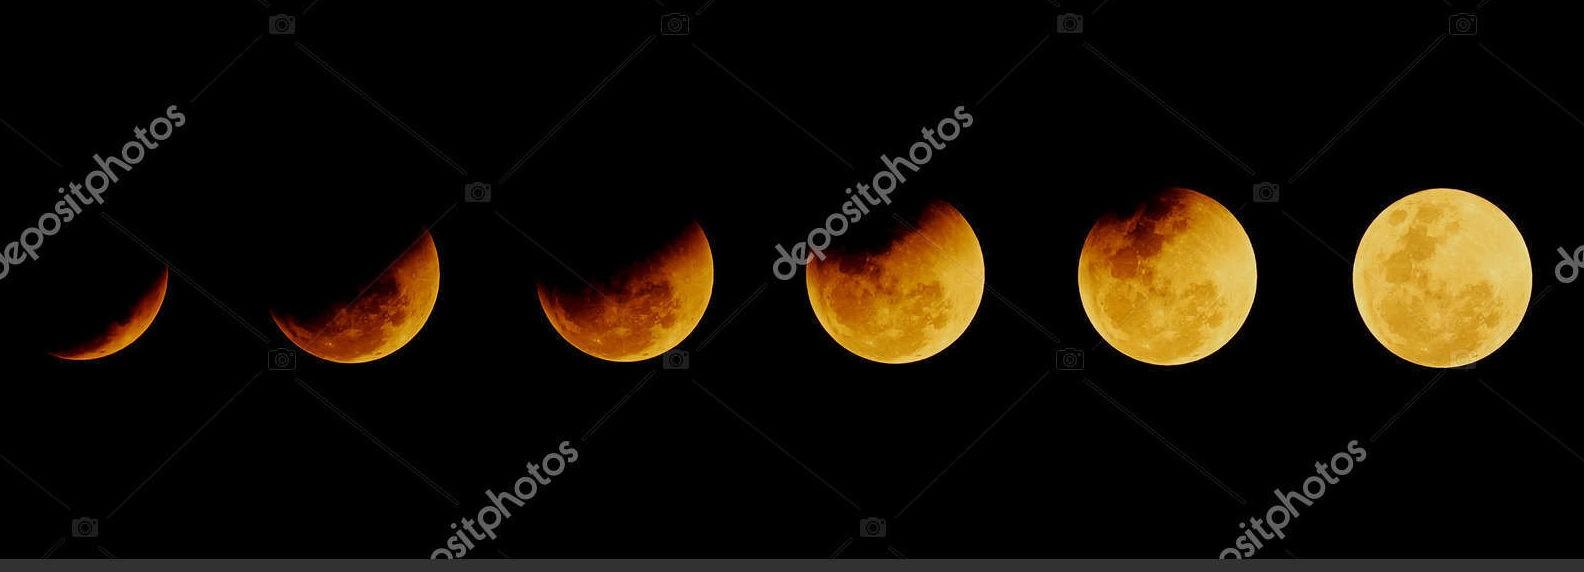 Лунное затмение, панорама